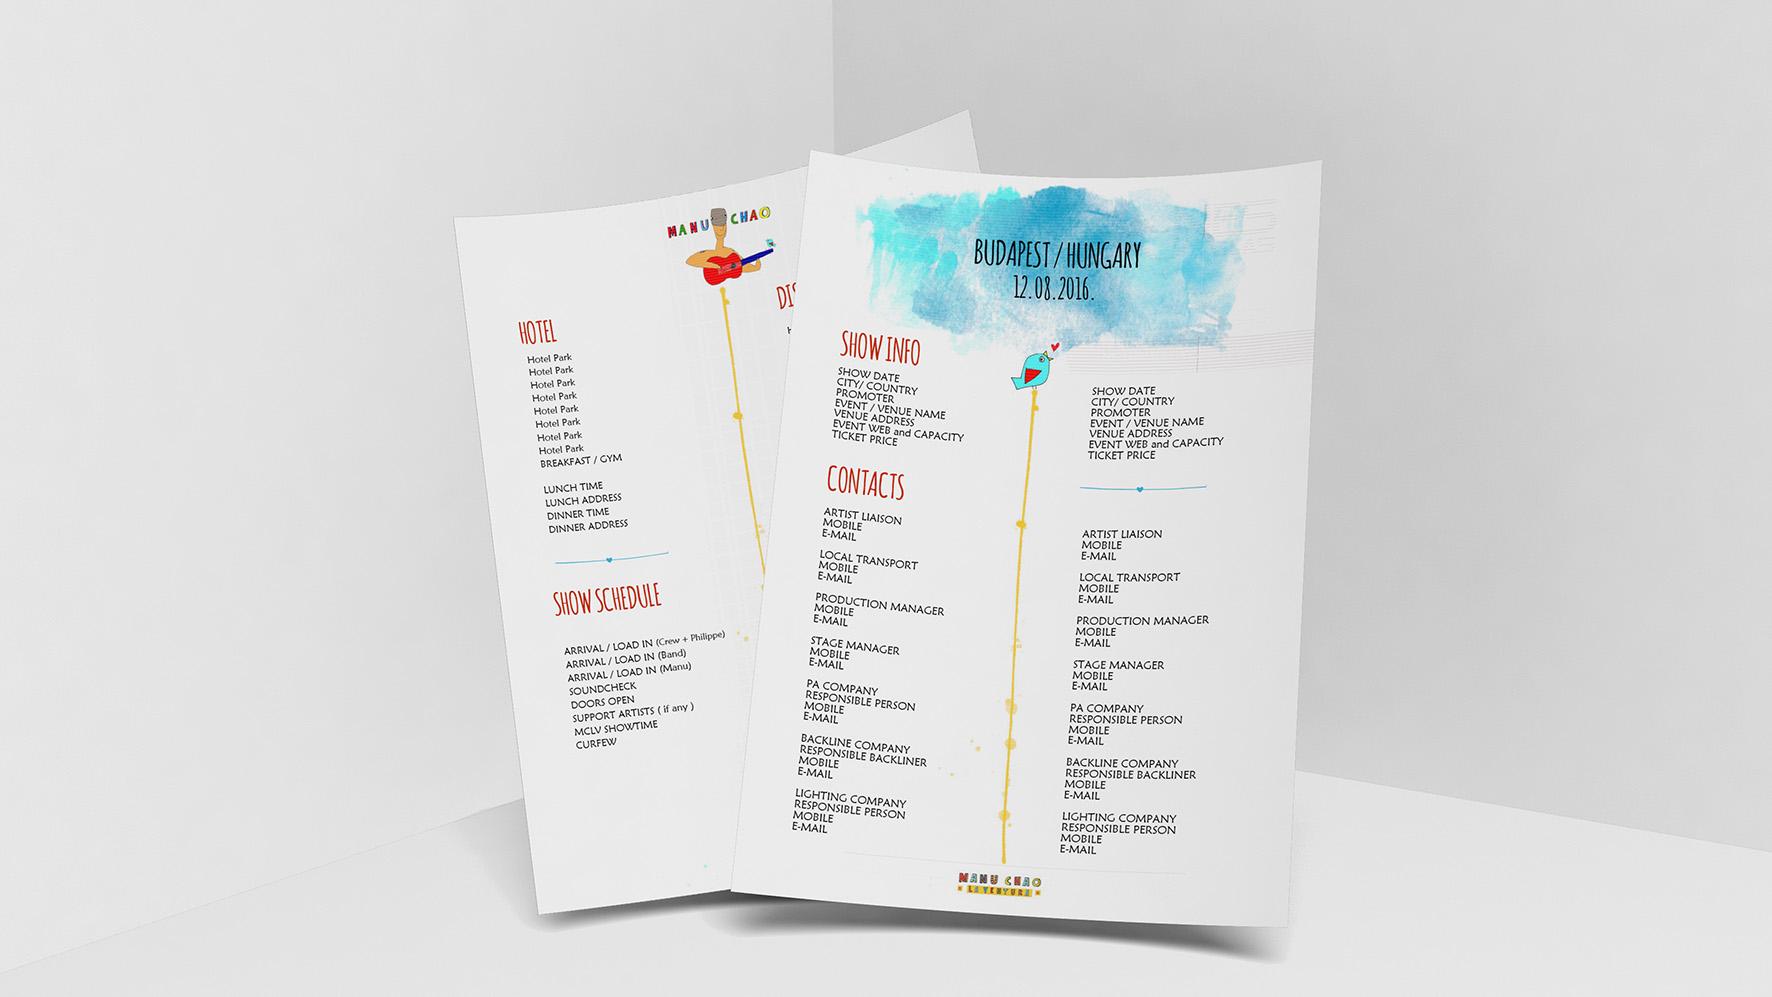 Manu Chao event sheet